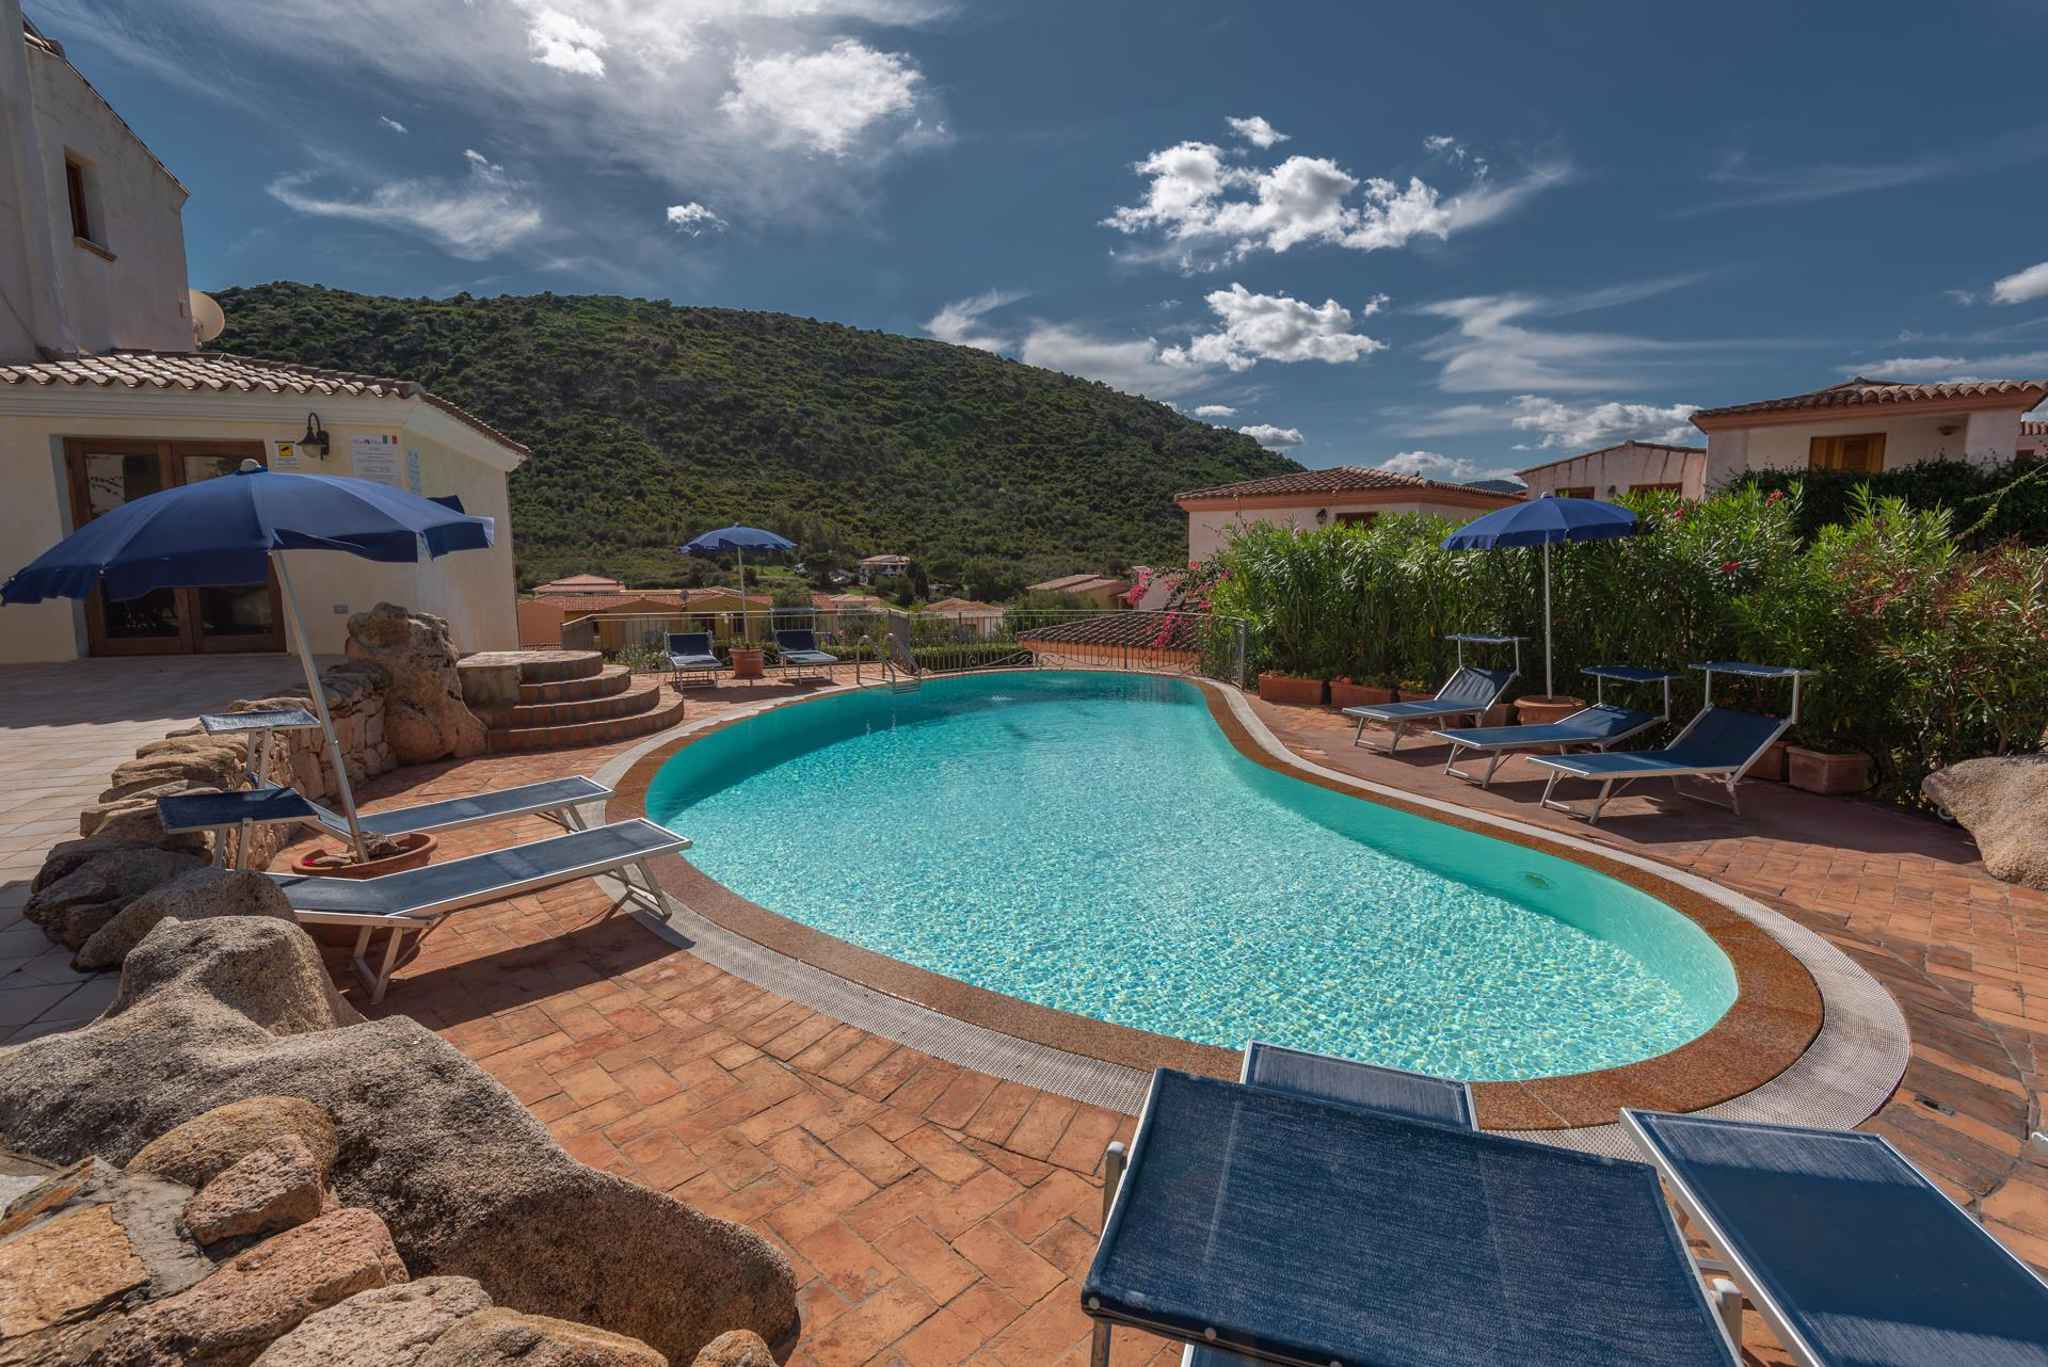 Ferienwohnung con piscina ed aria condizionata (2218559), Budoni, Olbia-Tempio, Sardinien, Italien, Bild 7